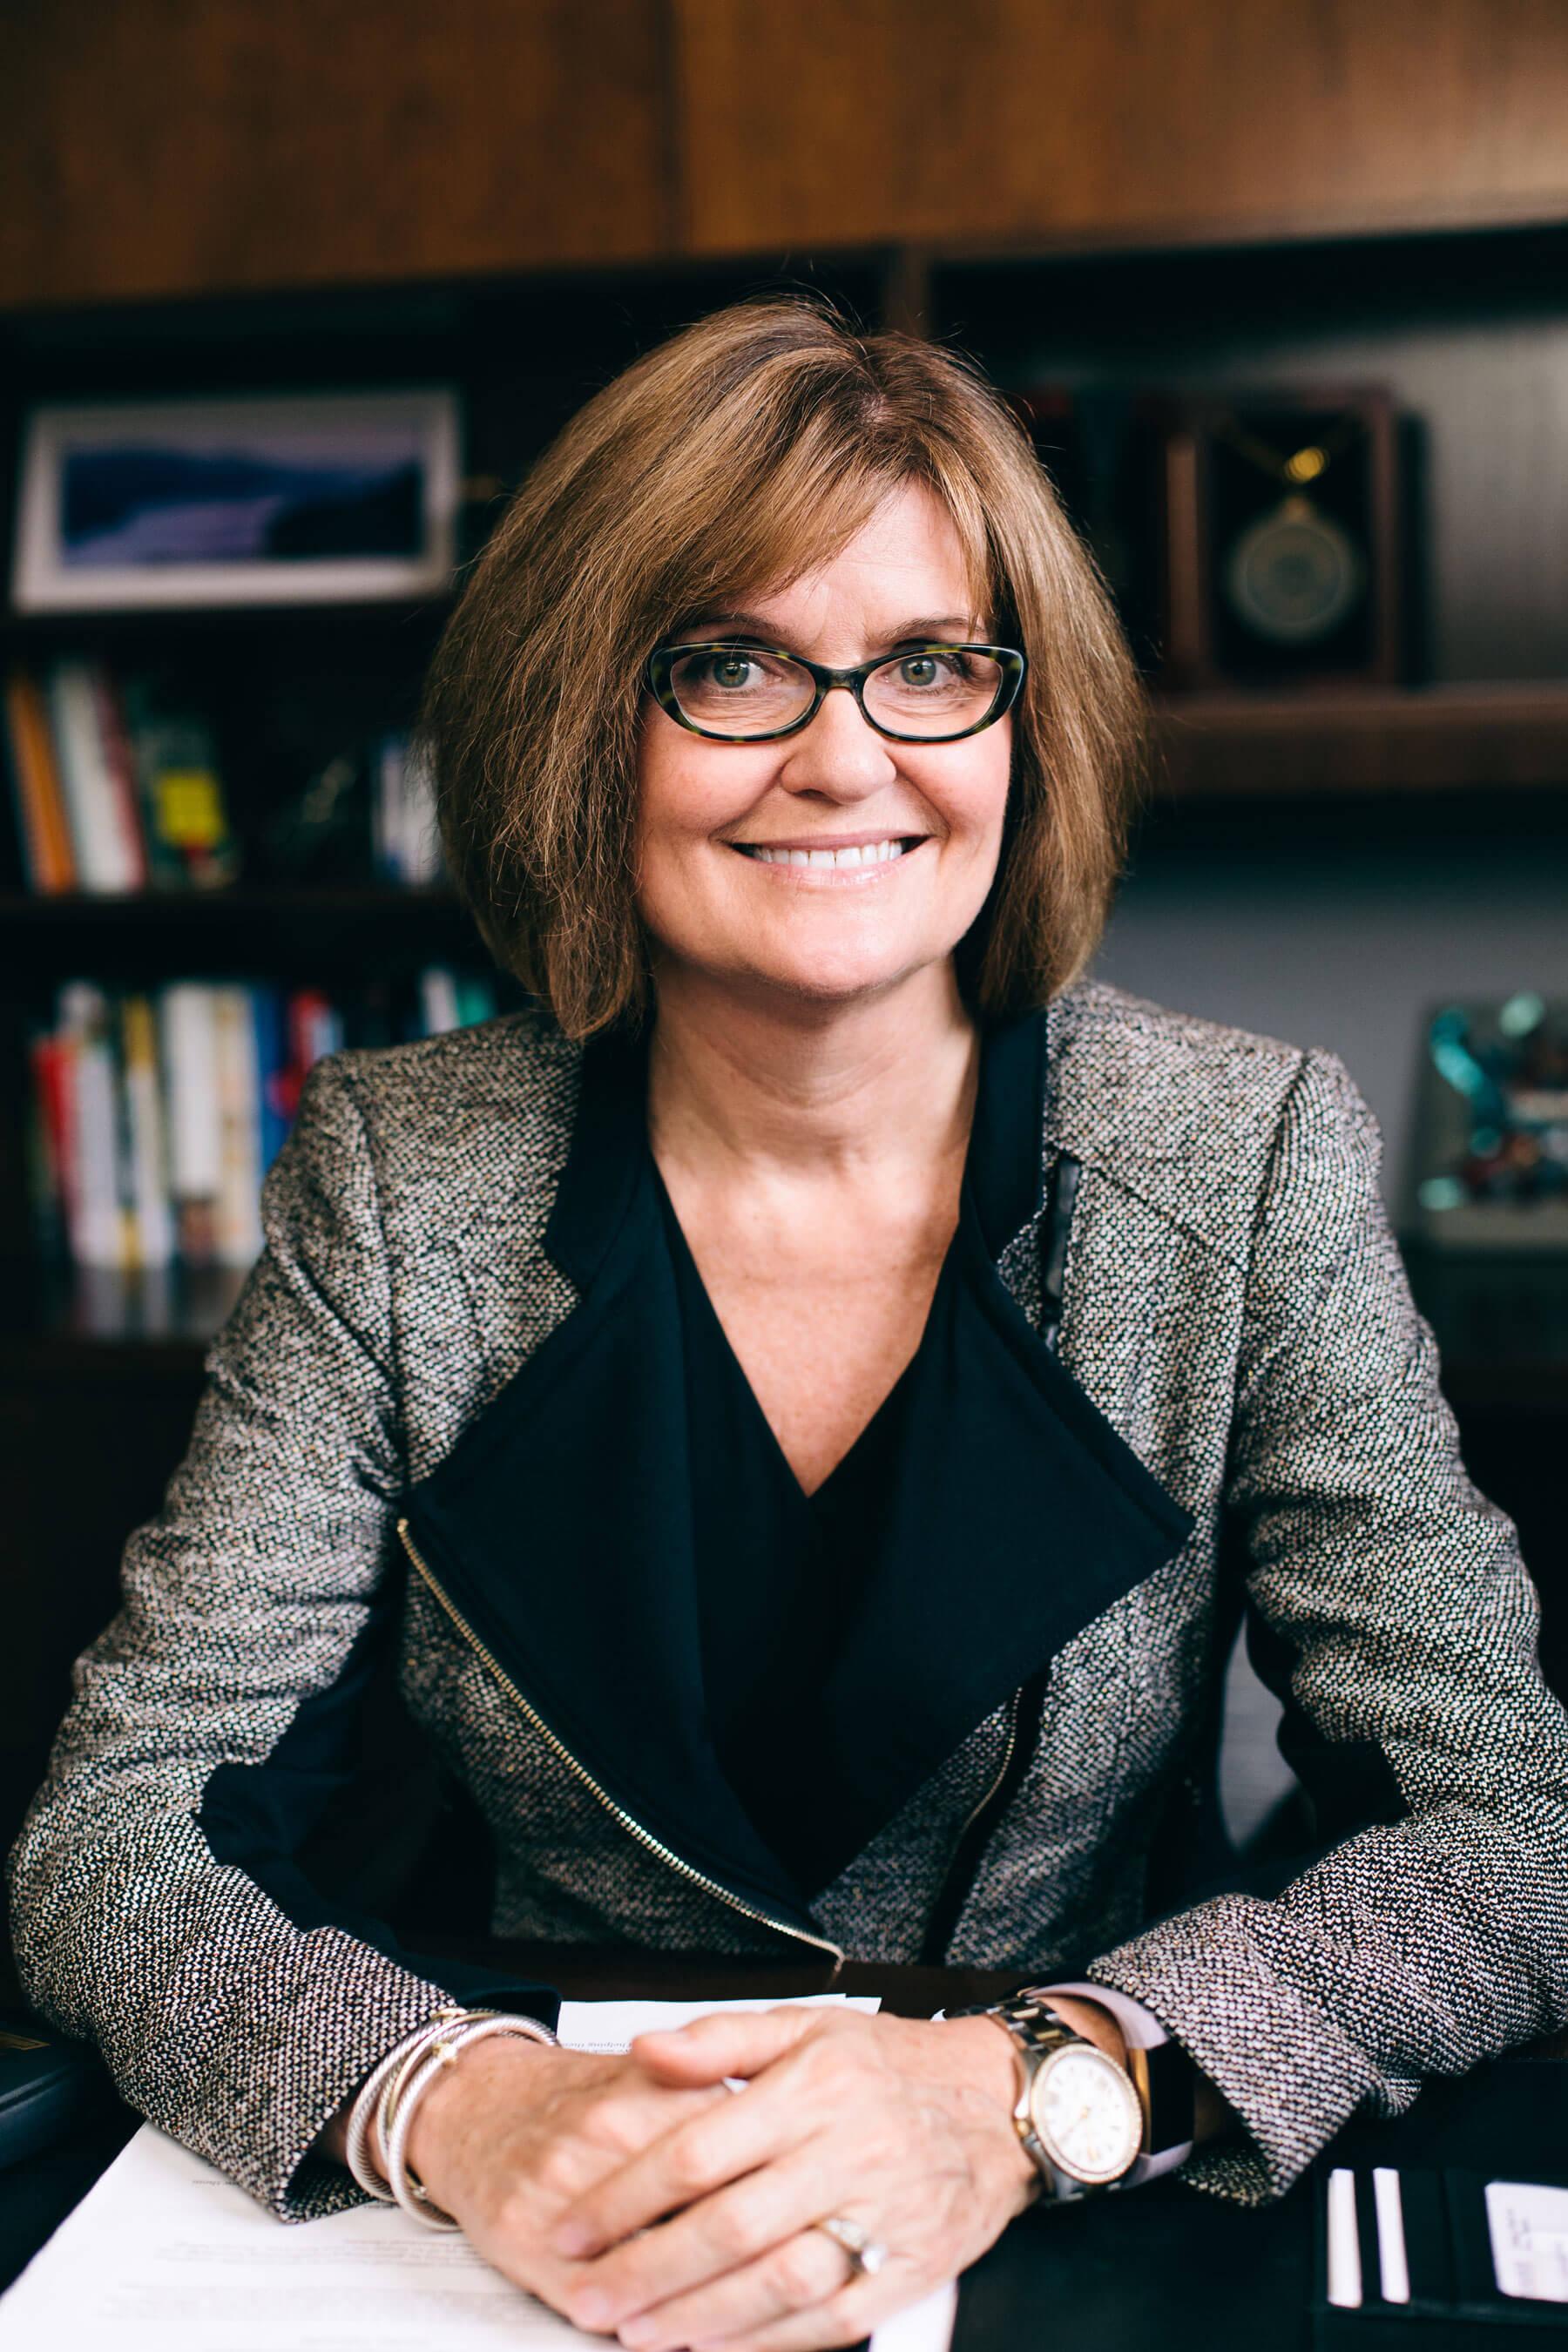 Marion K. Underwood, Ph.D